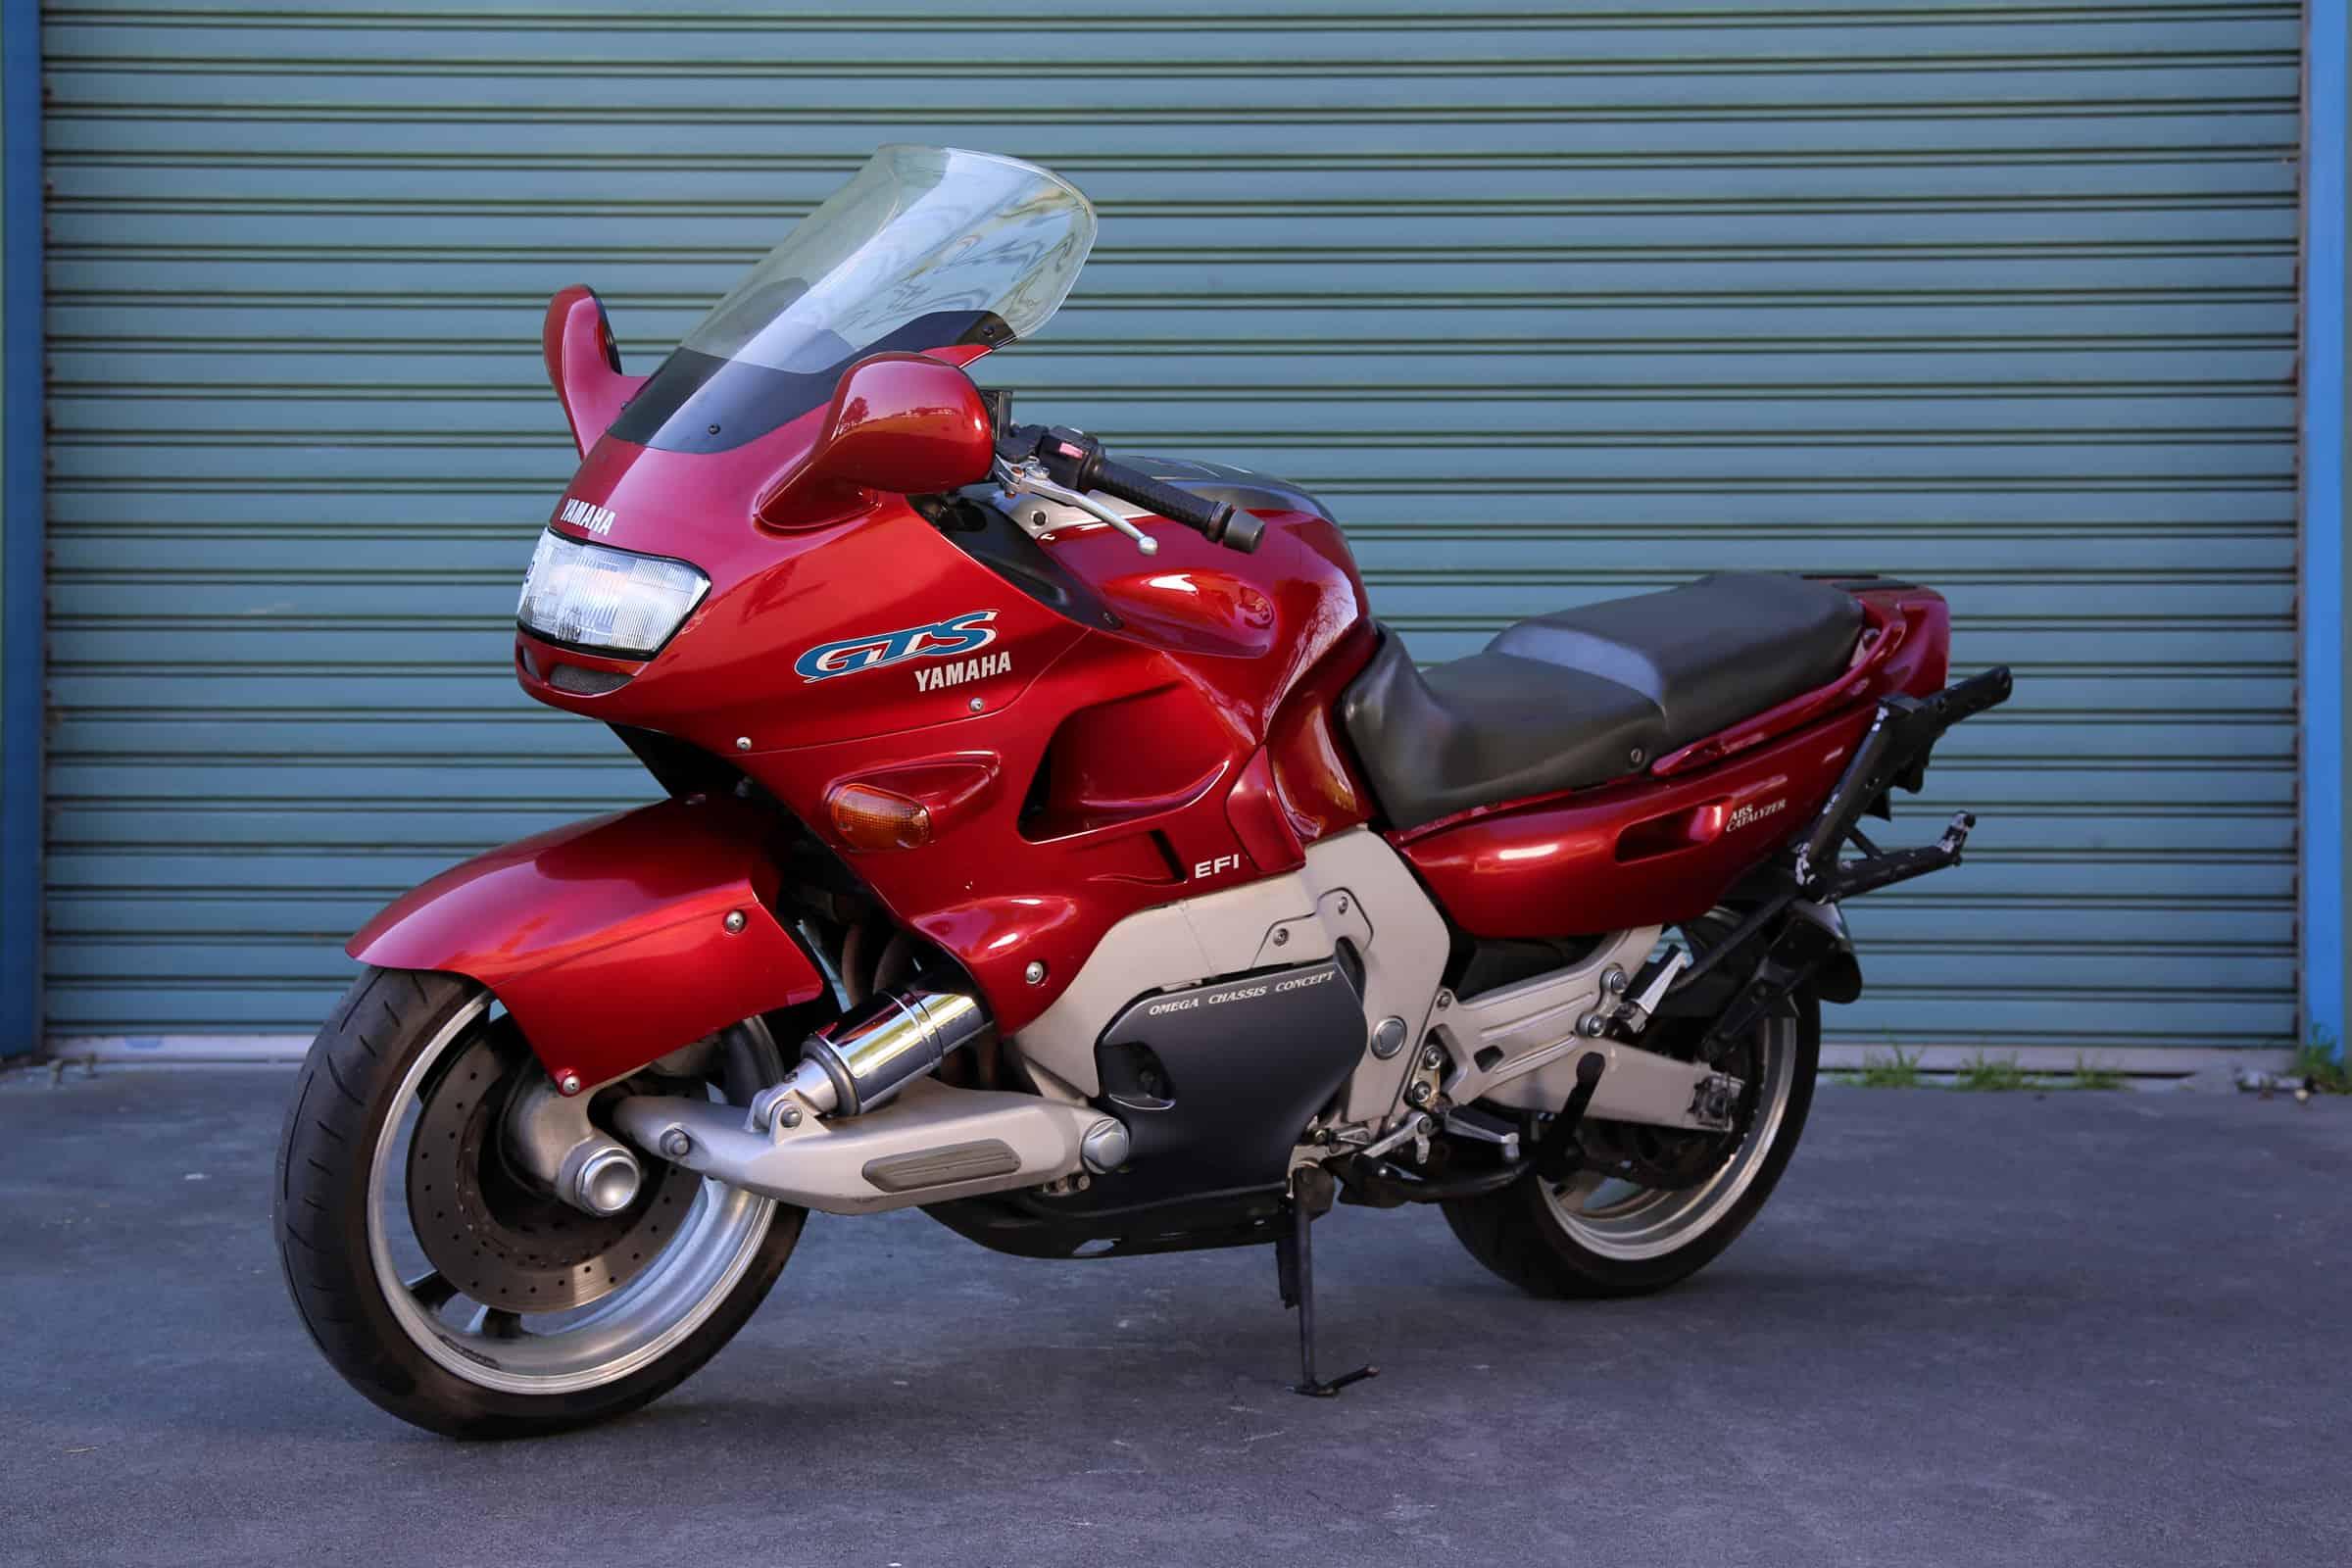 Yamaha GTS 1000 vale a pena? Yamaha-GTS-red-f45ls